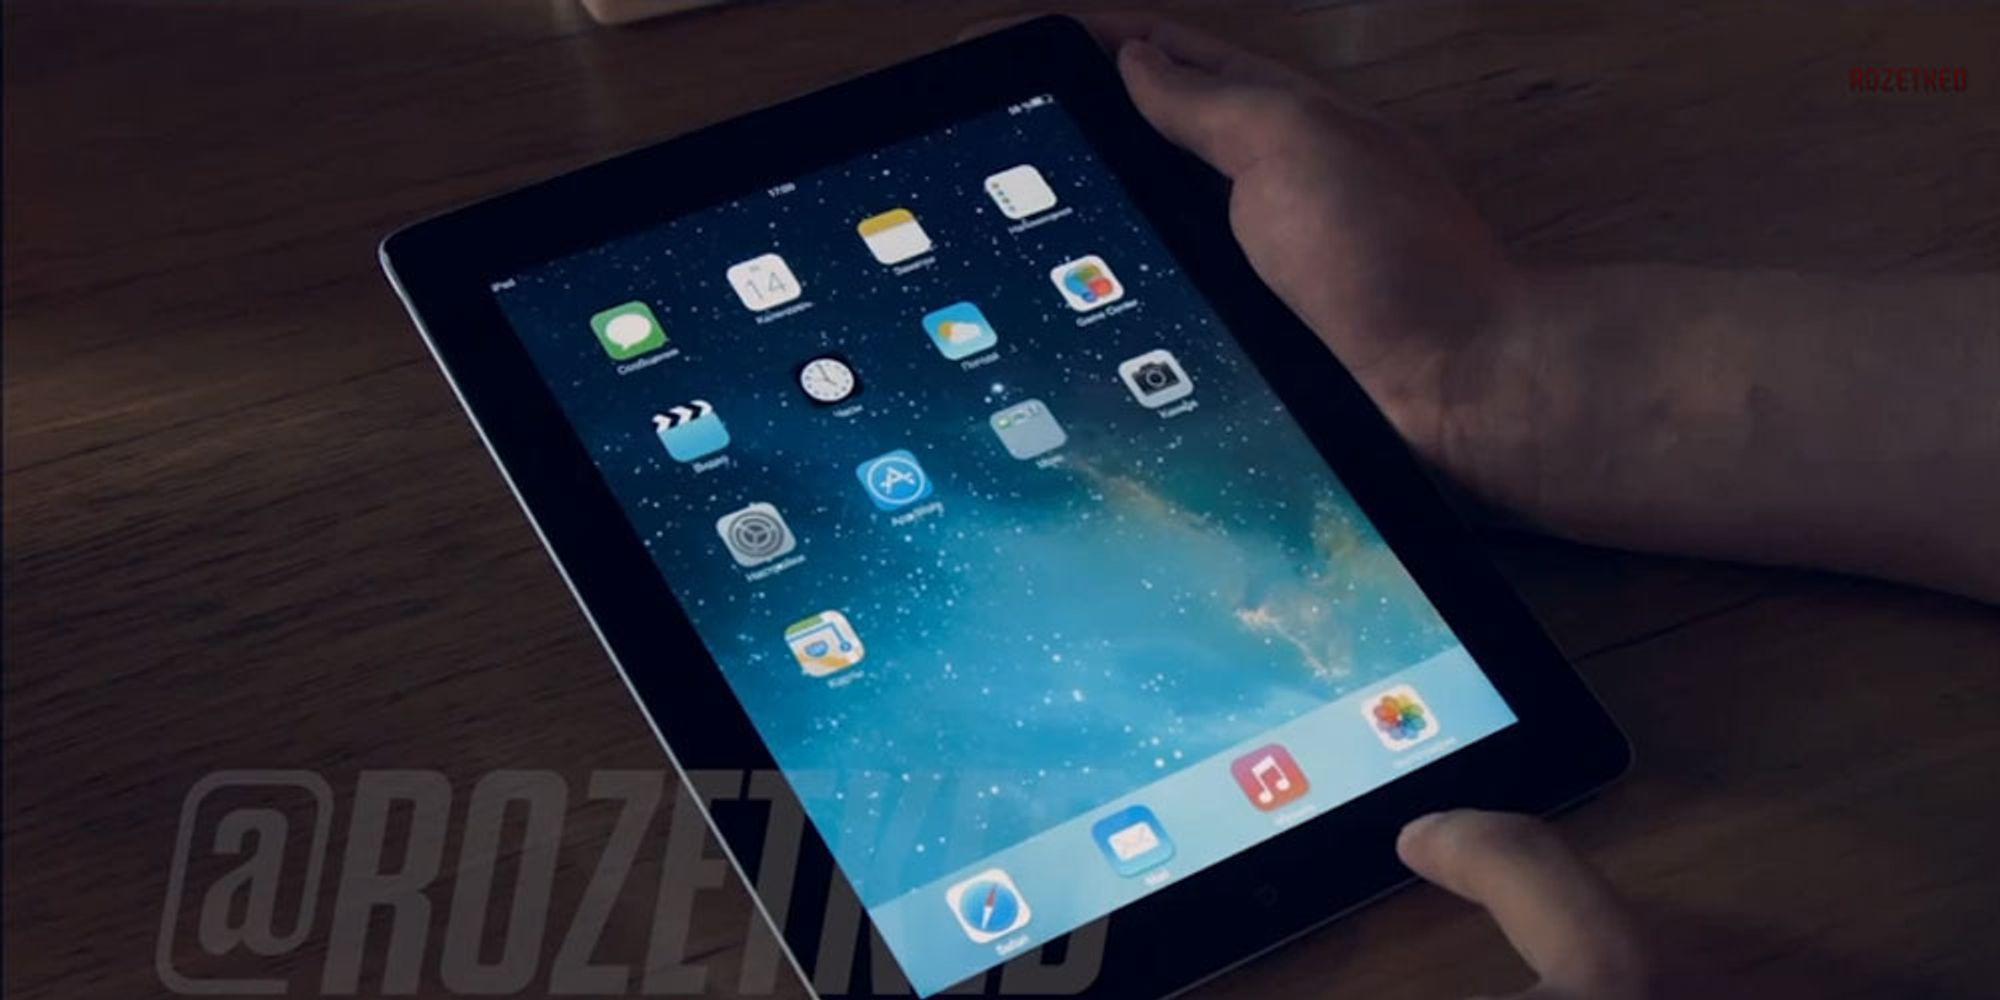 Slik ser iOS 7 for iPad ut